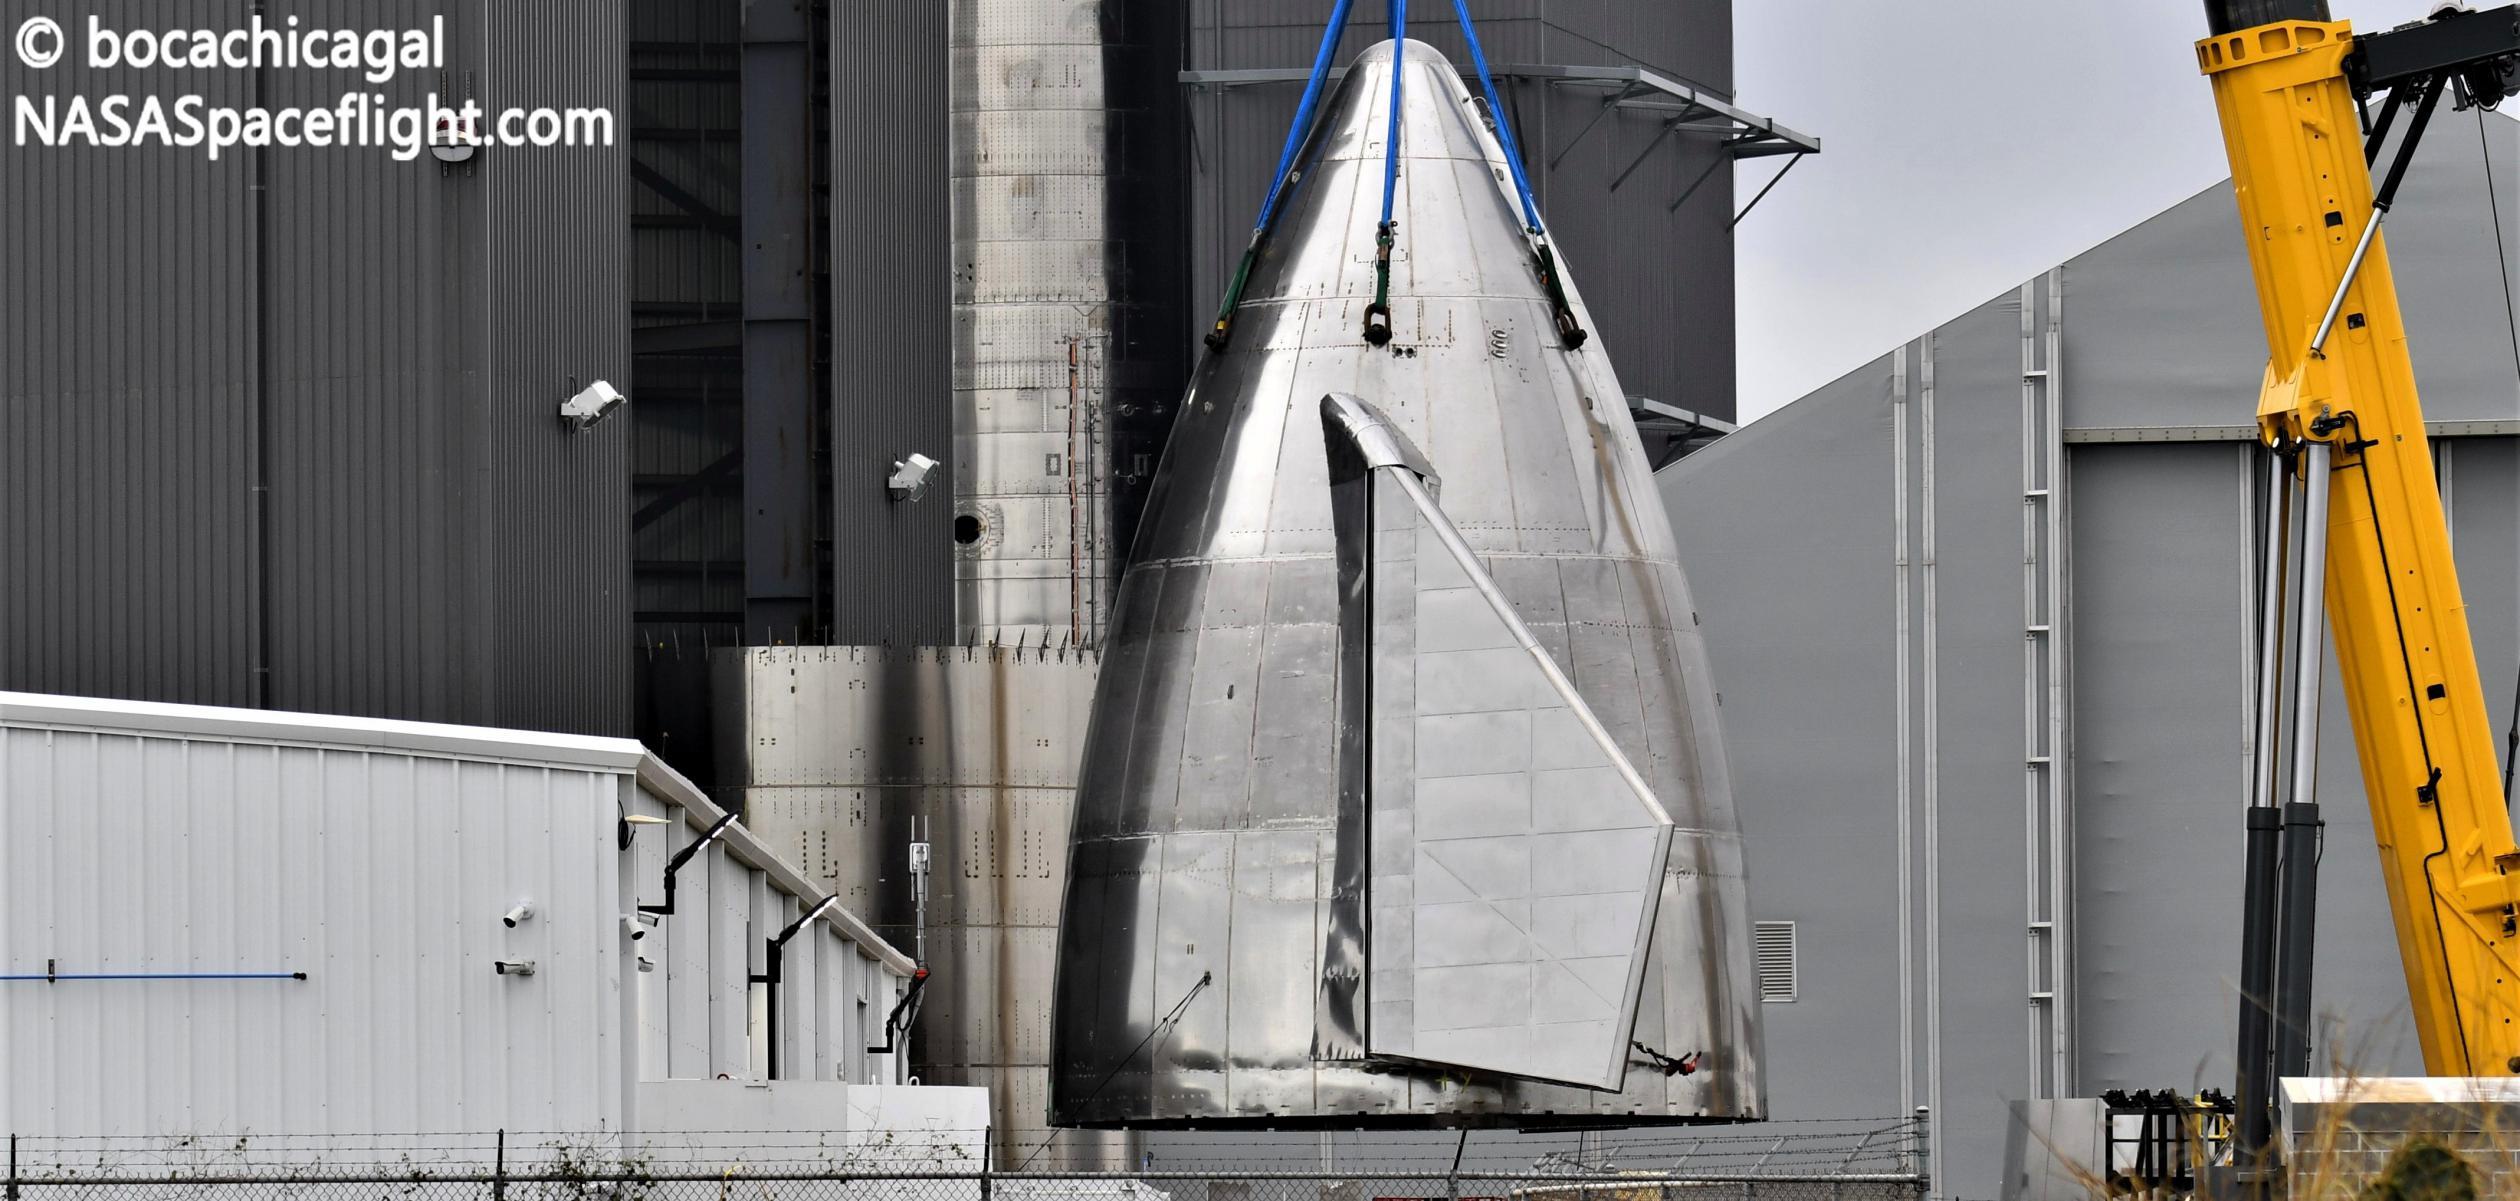 Starship Boca Chica 121920 (NASASpaceflight – bocachicagal) SN10 nose stack 1 crop (c)